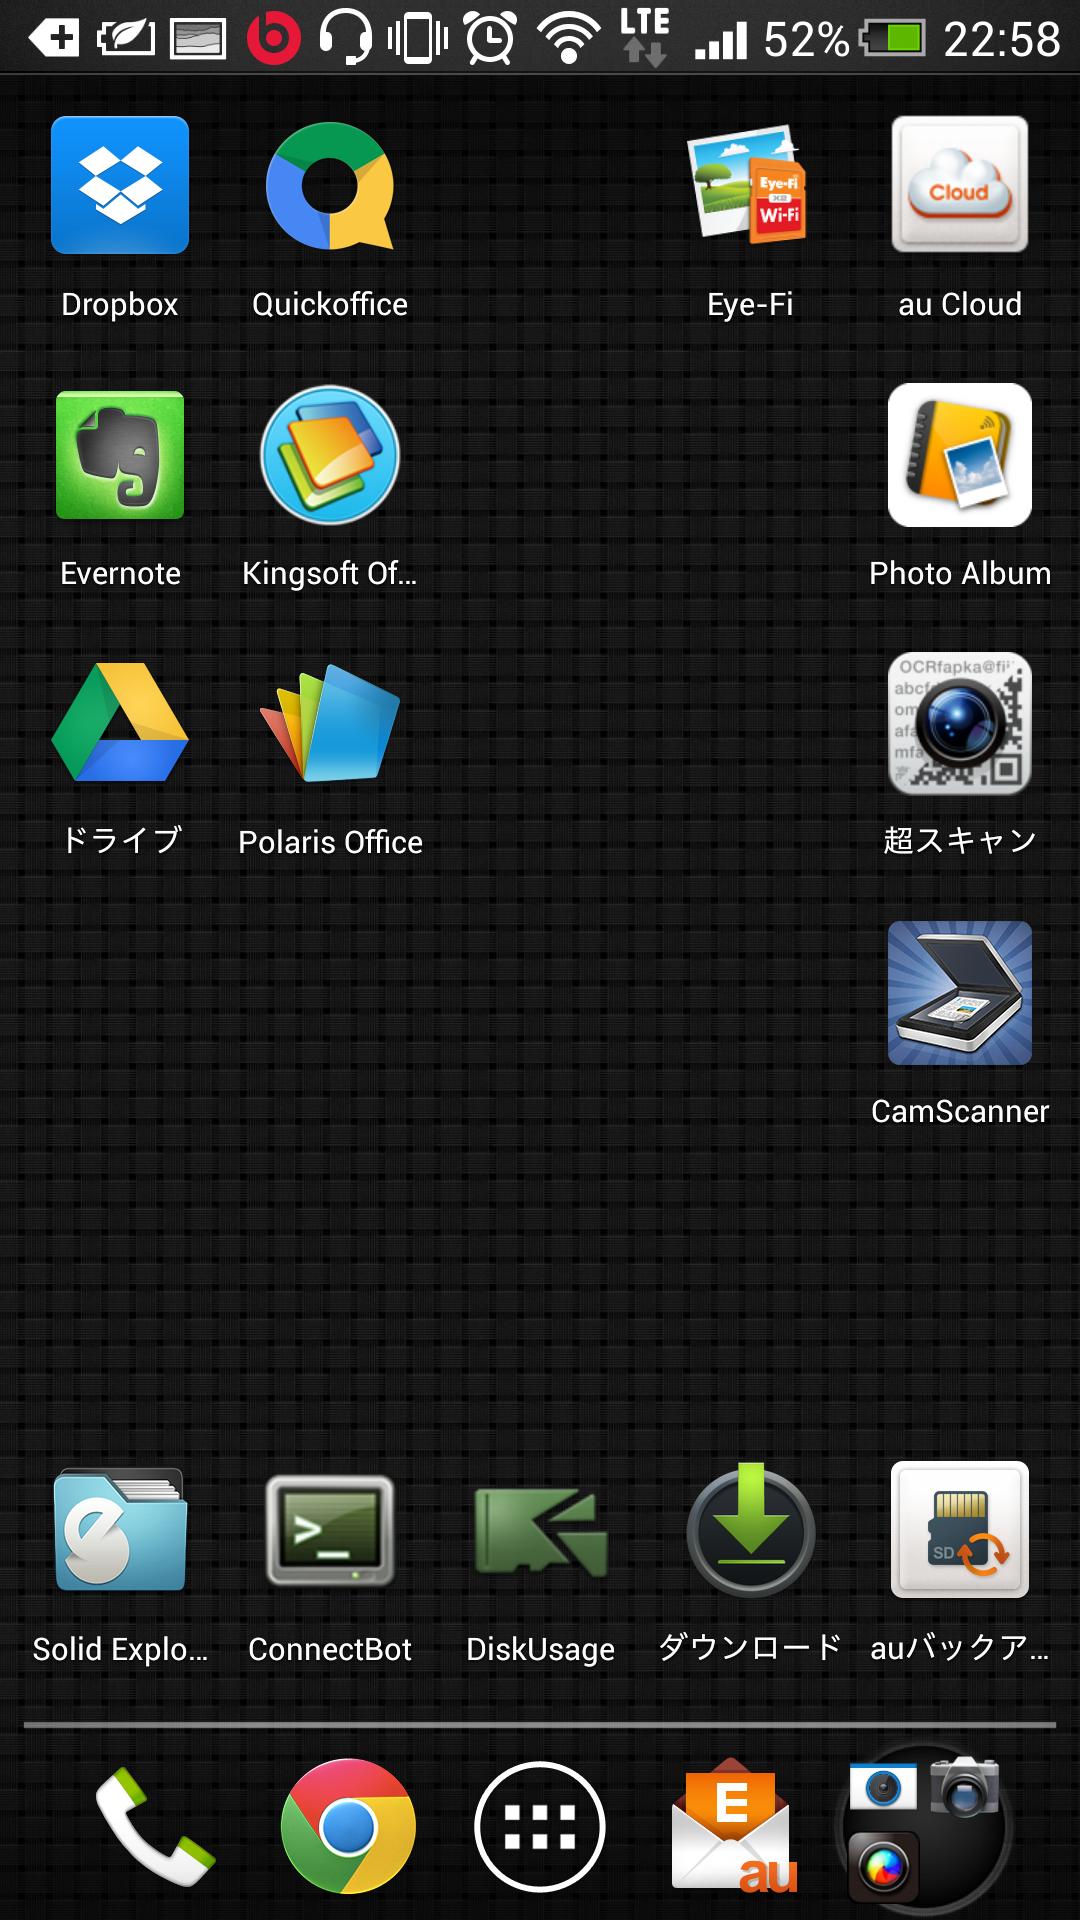 Android(HTL22)で使用しているアプリ達